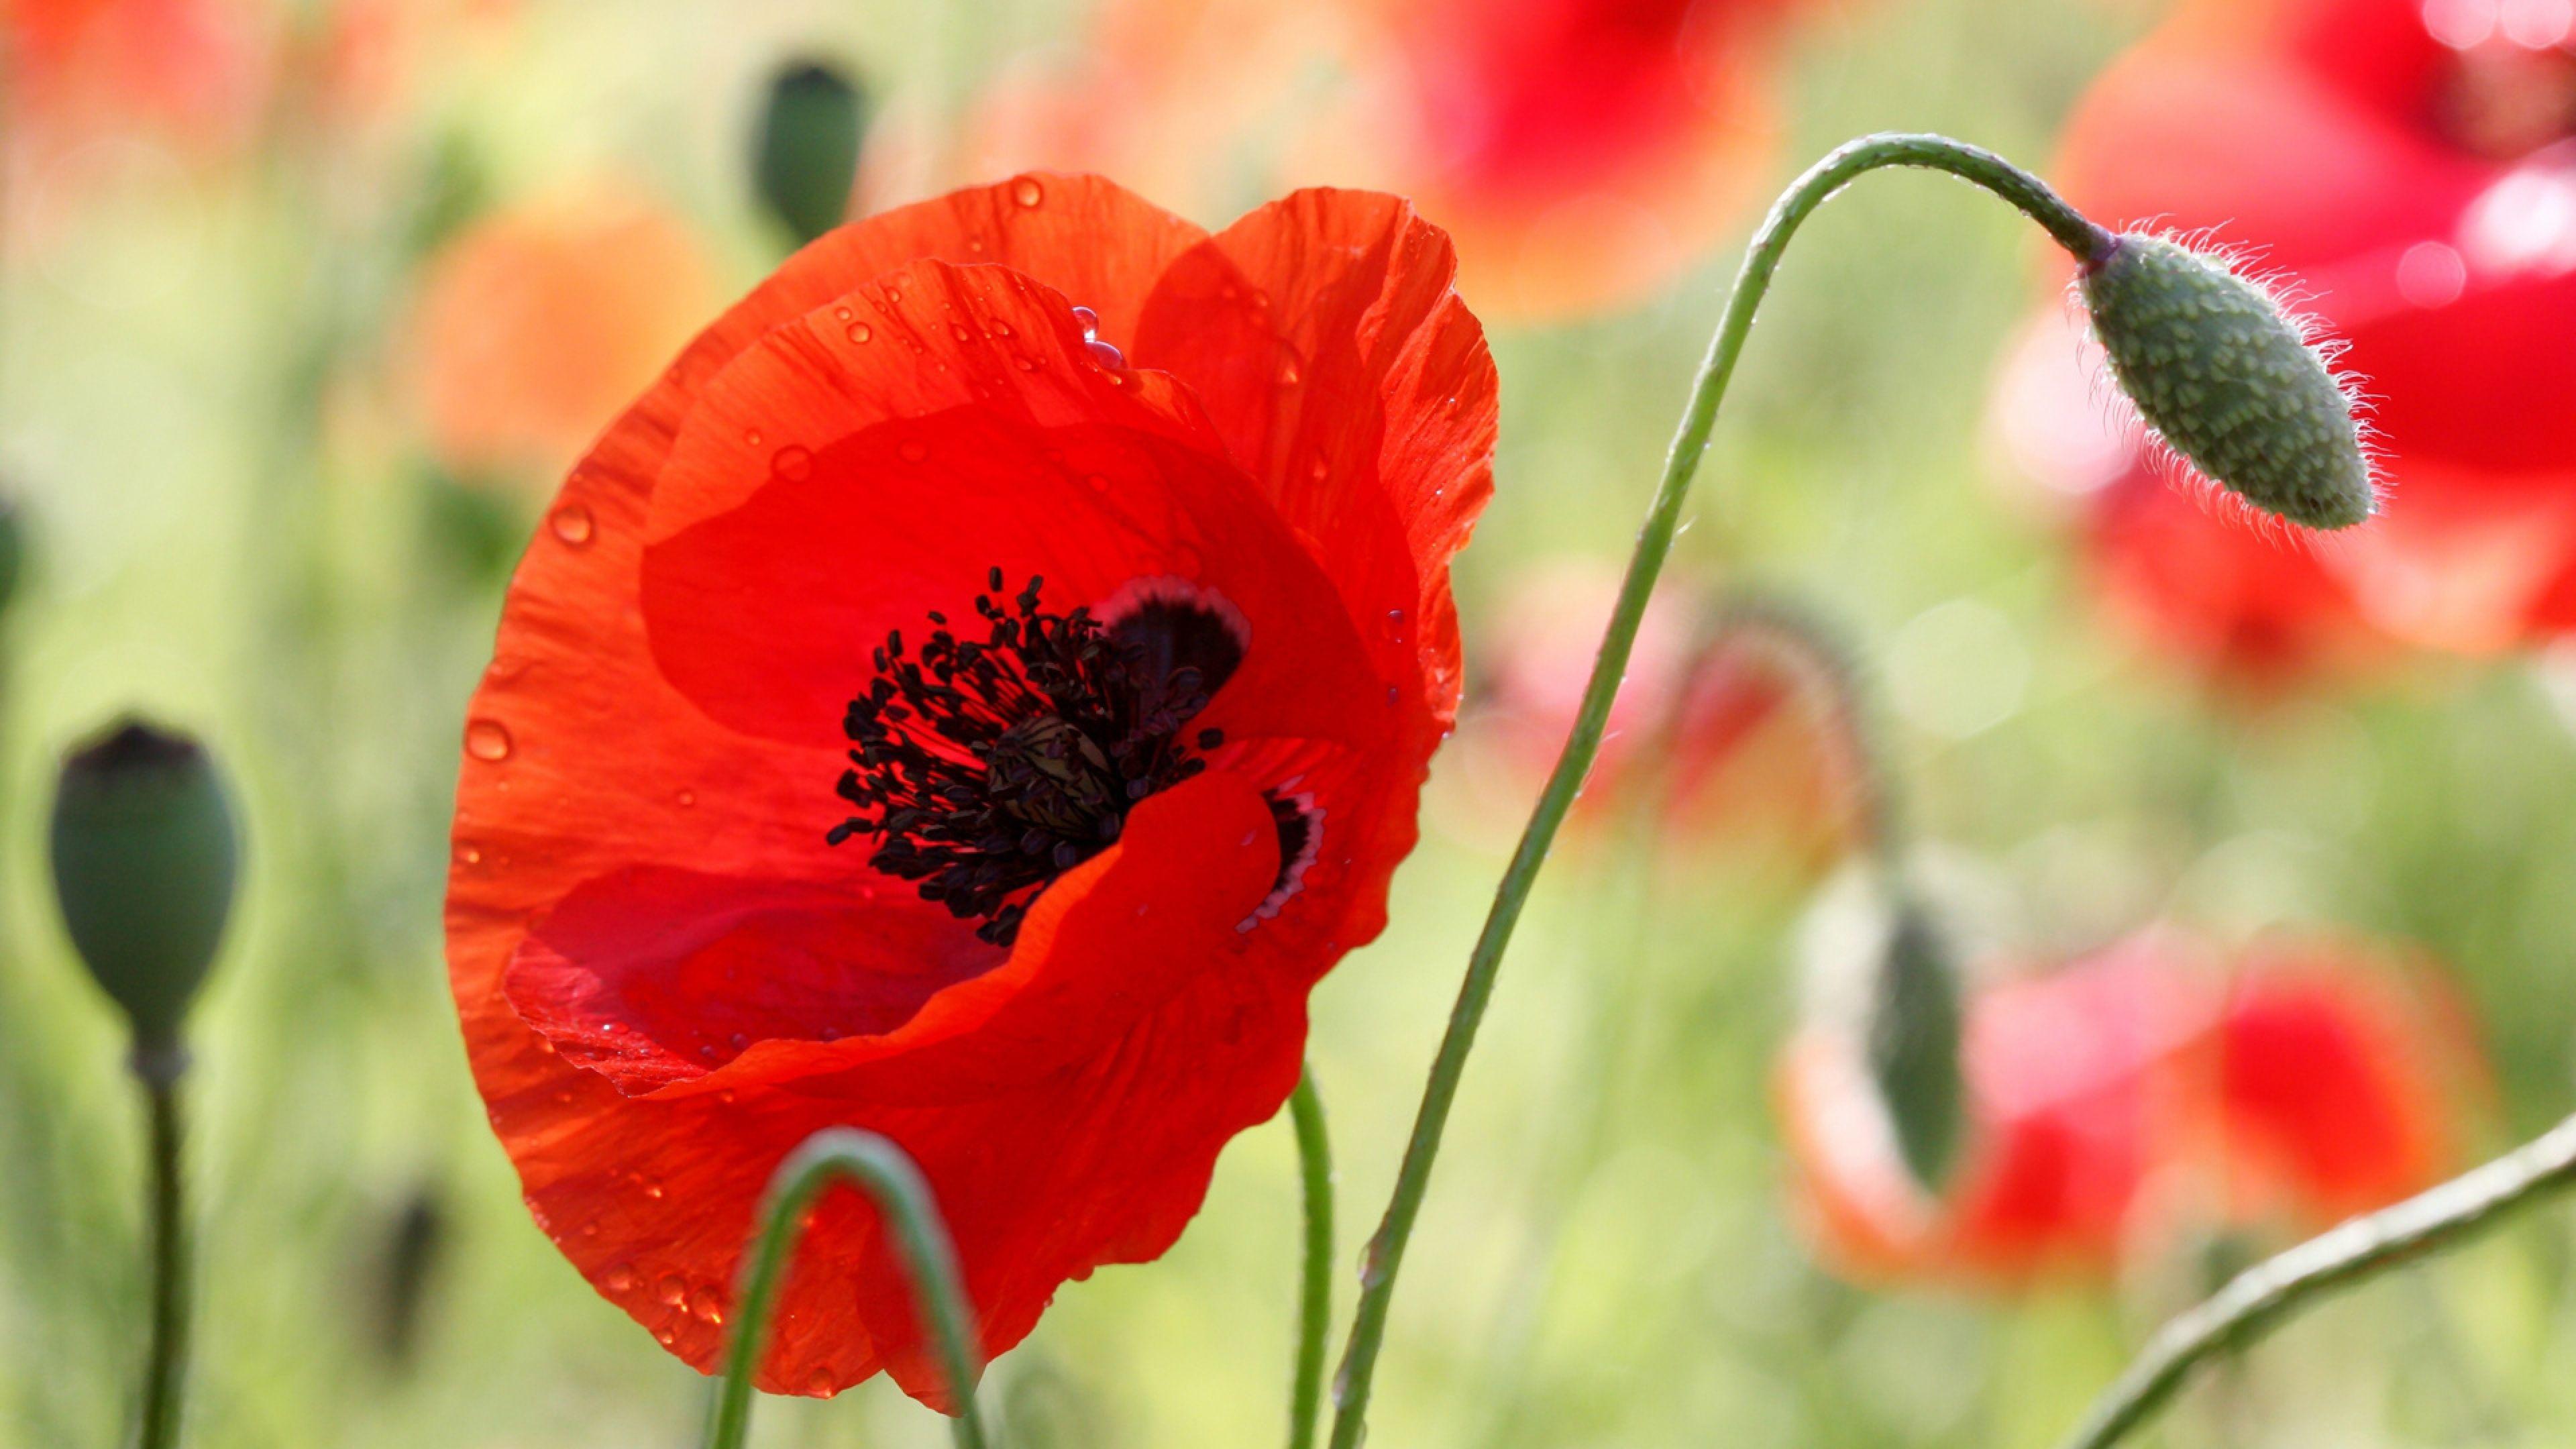 Download Wallpaper 3840x2160 Poppy Flower Bud Stamens Field